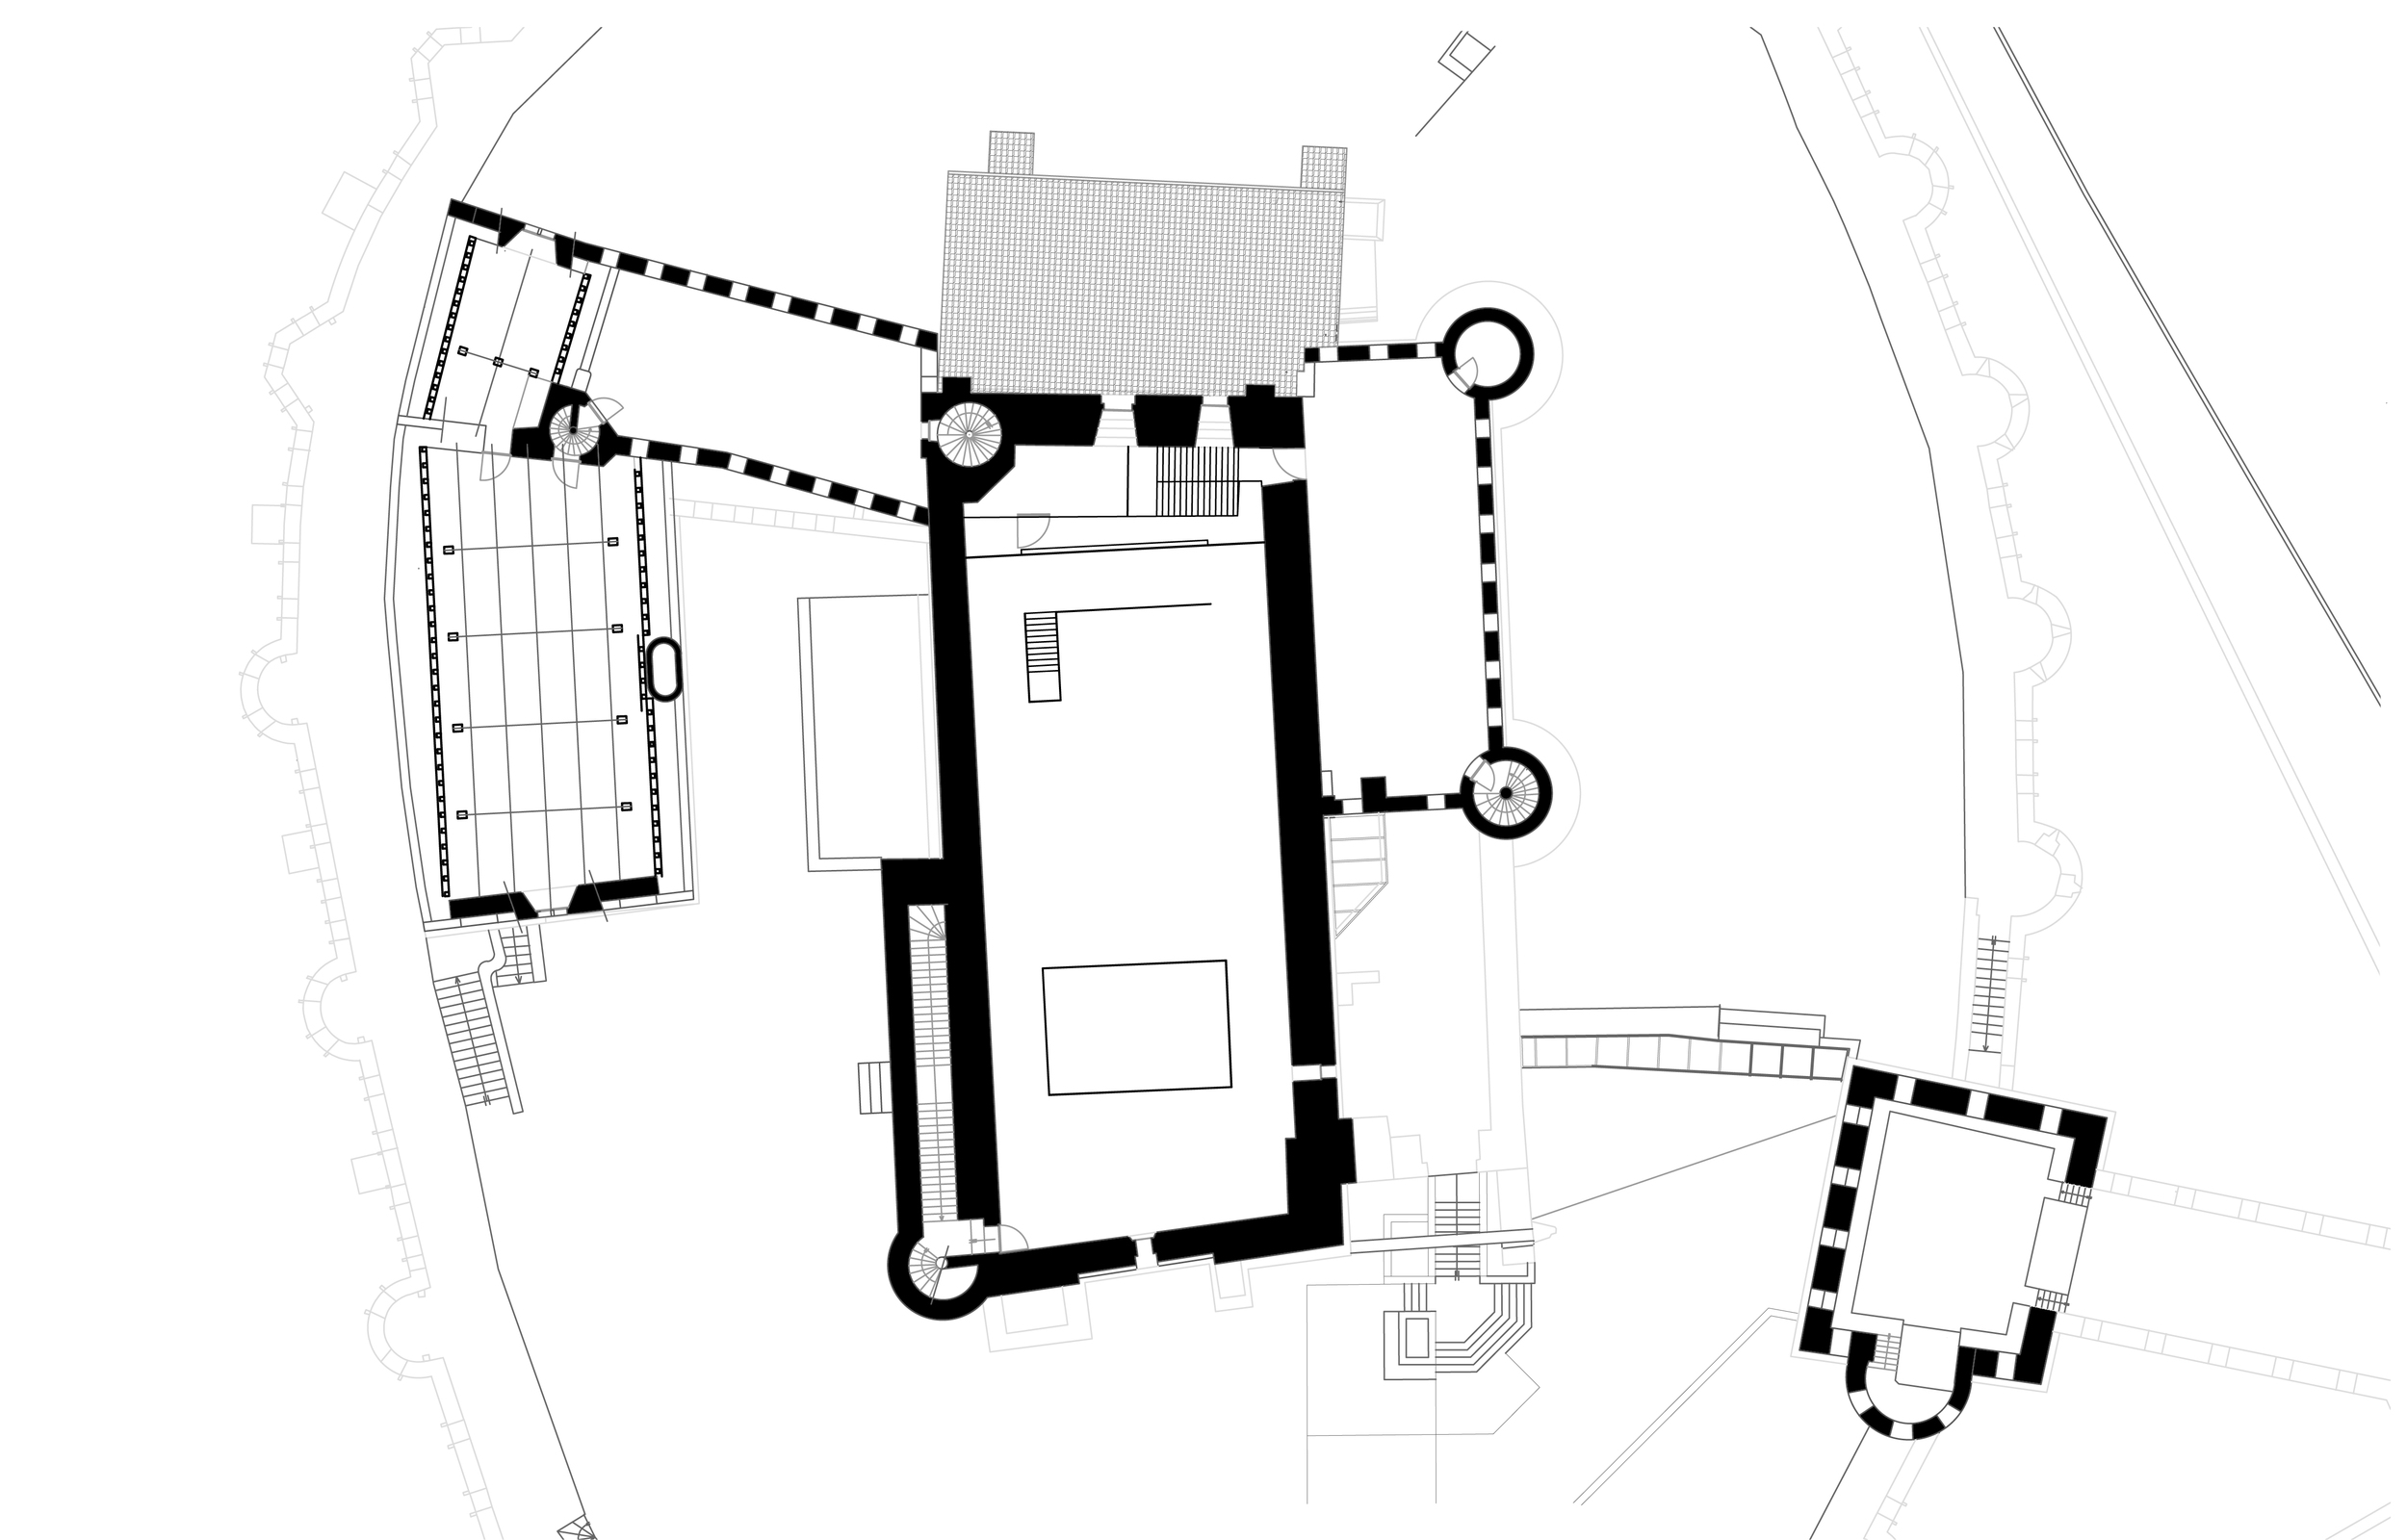 Opmeting Gravensteen-A3-+zolder_1-200.jpg